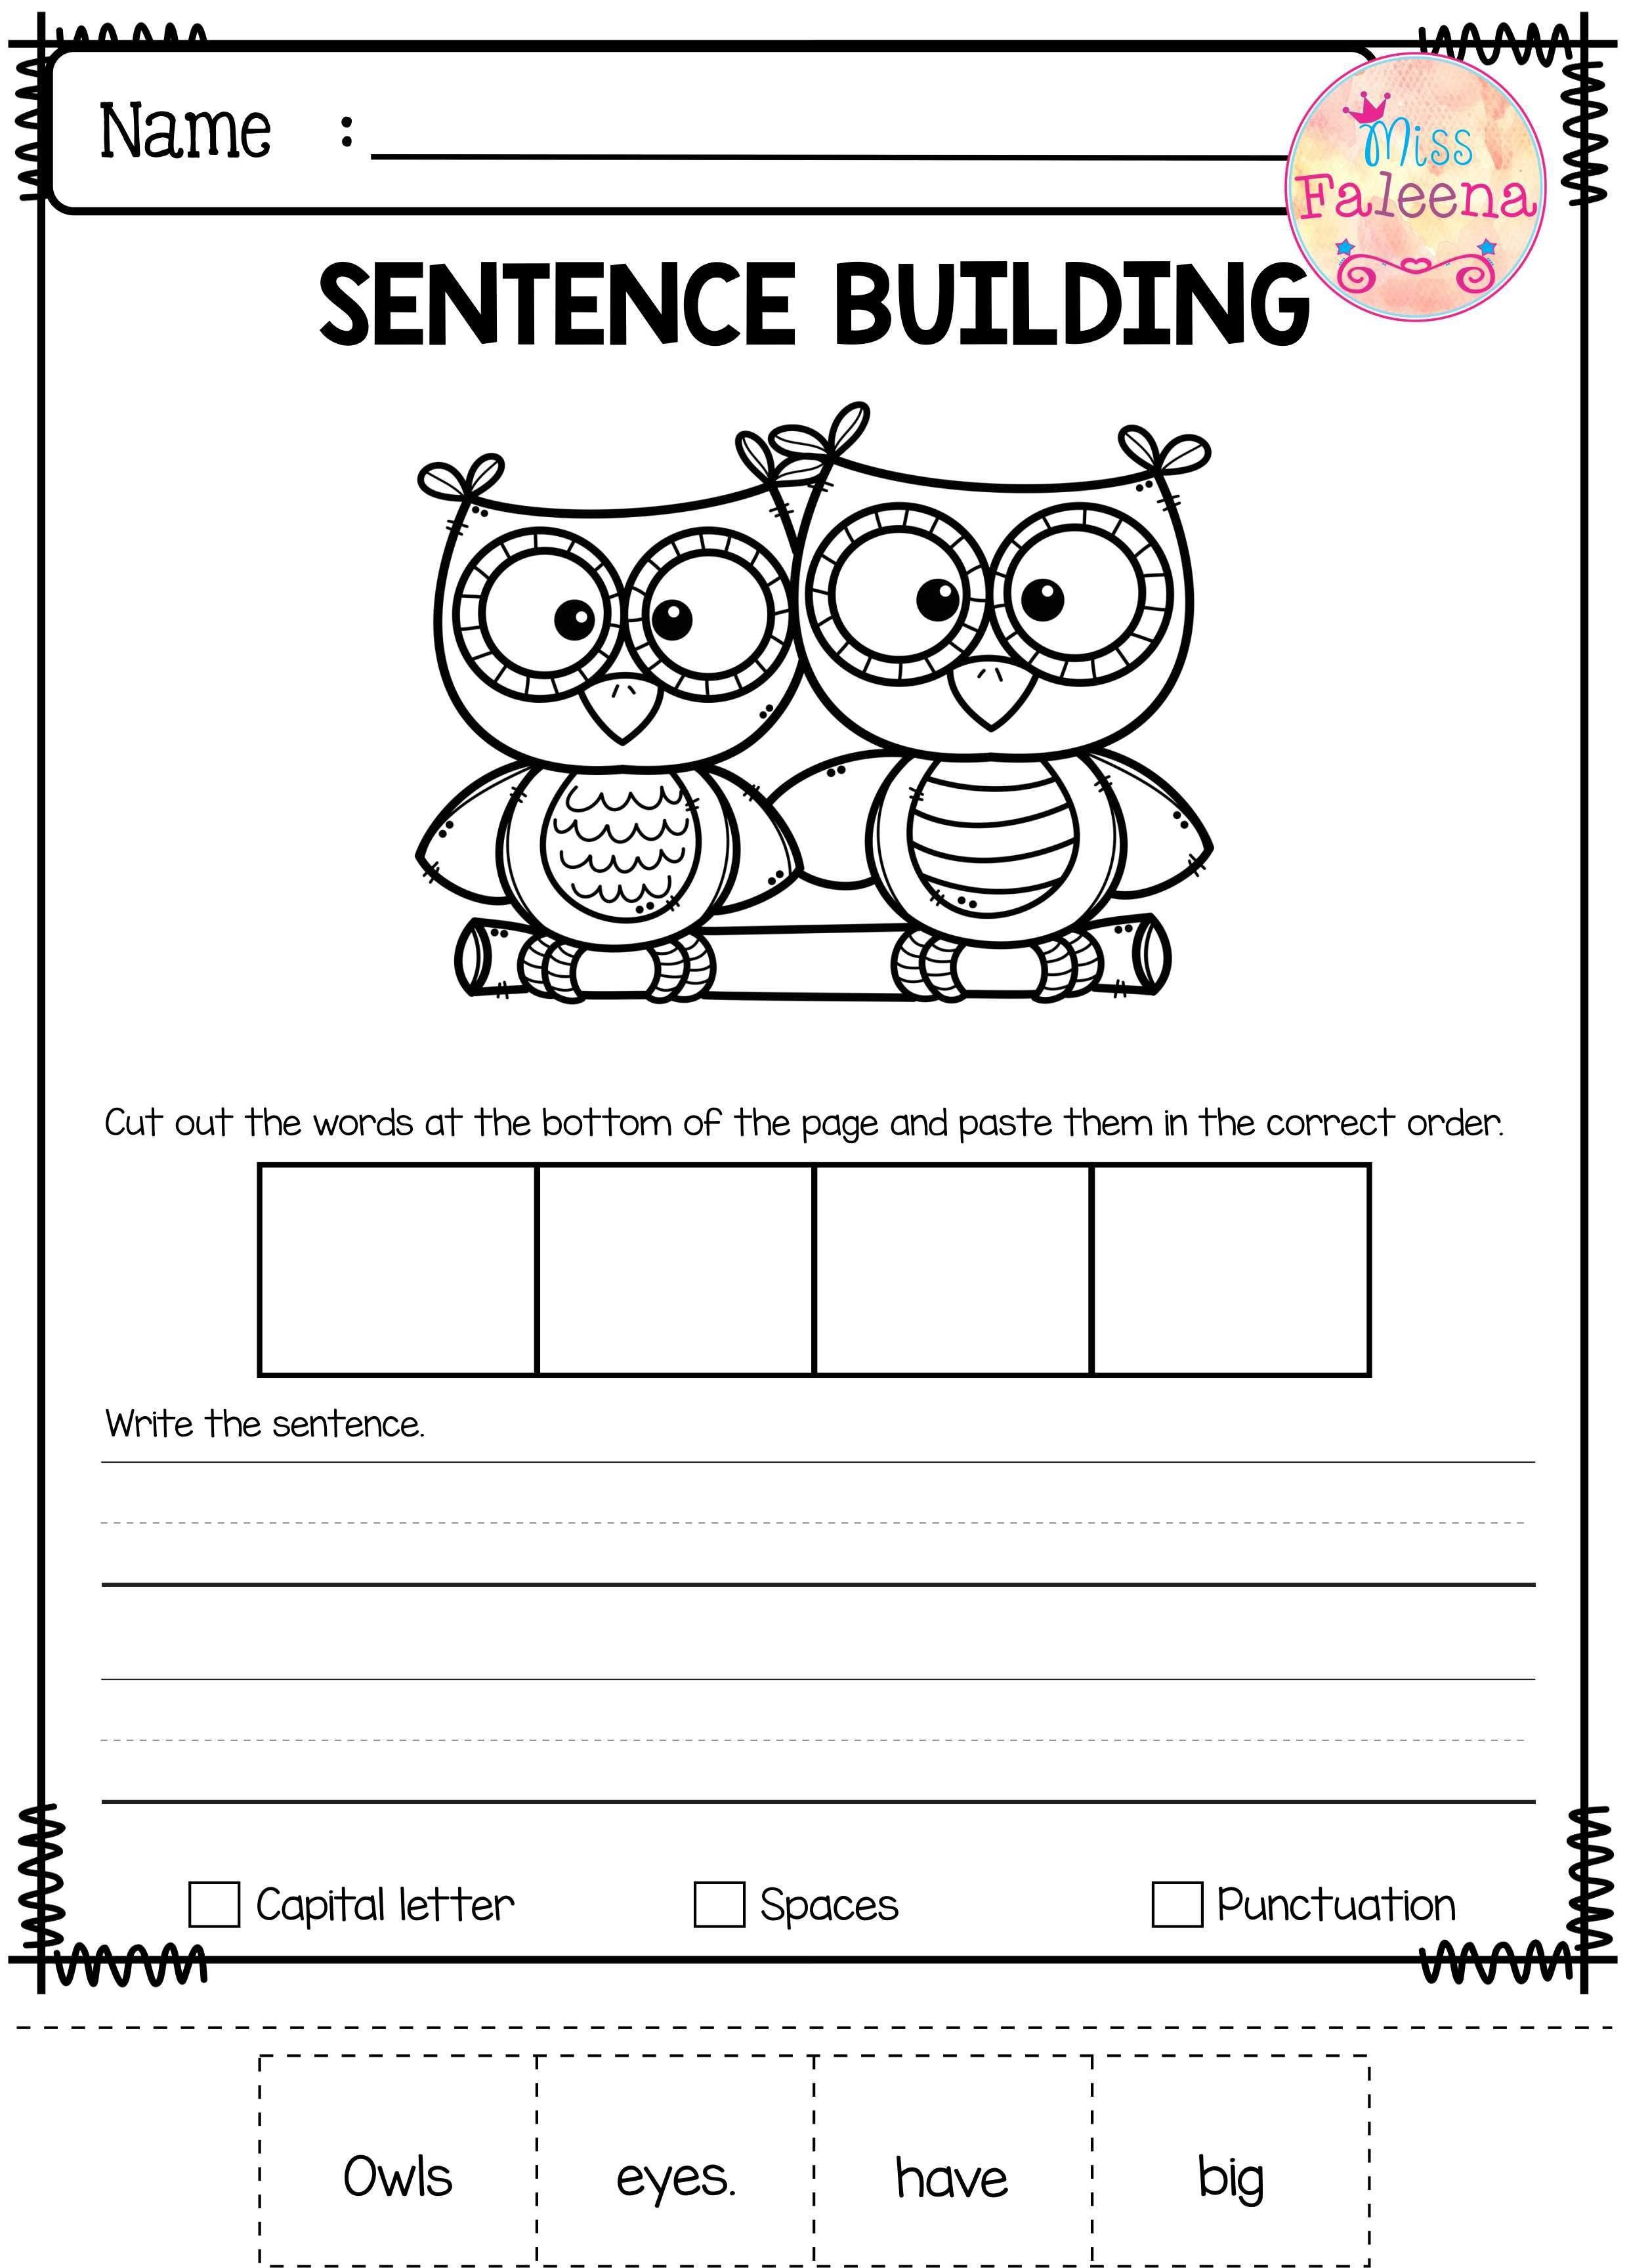 worksheet Sentence Building Worksheets august sentence building first grade worksheets building